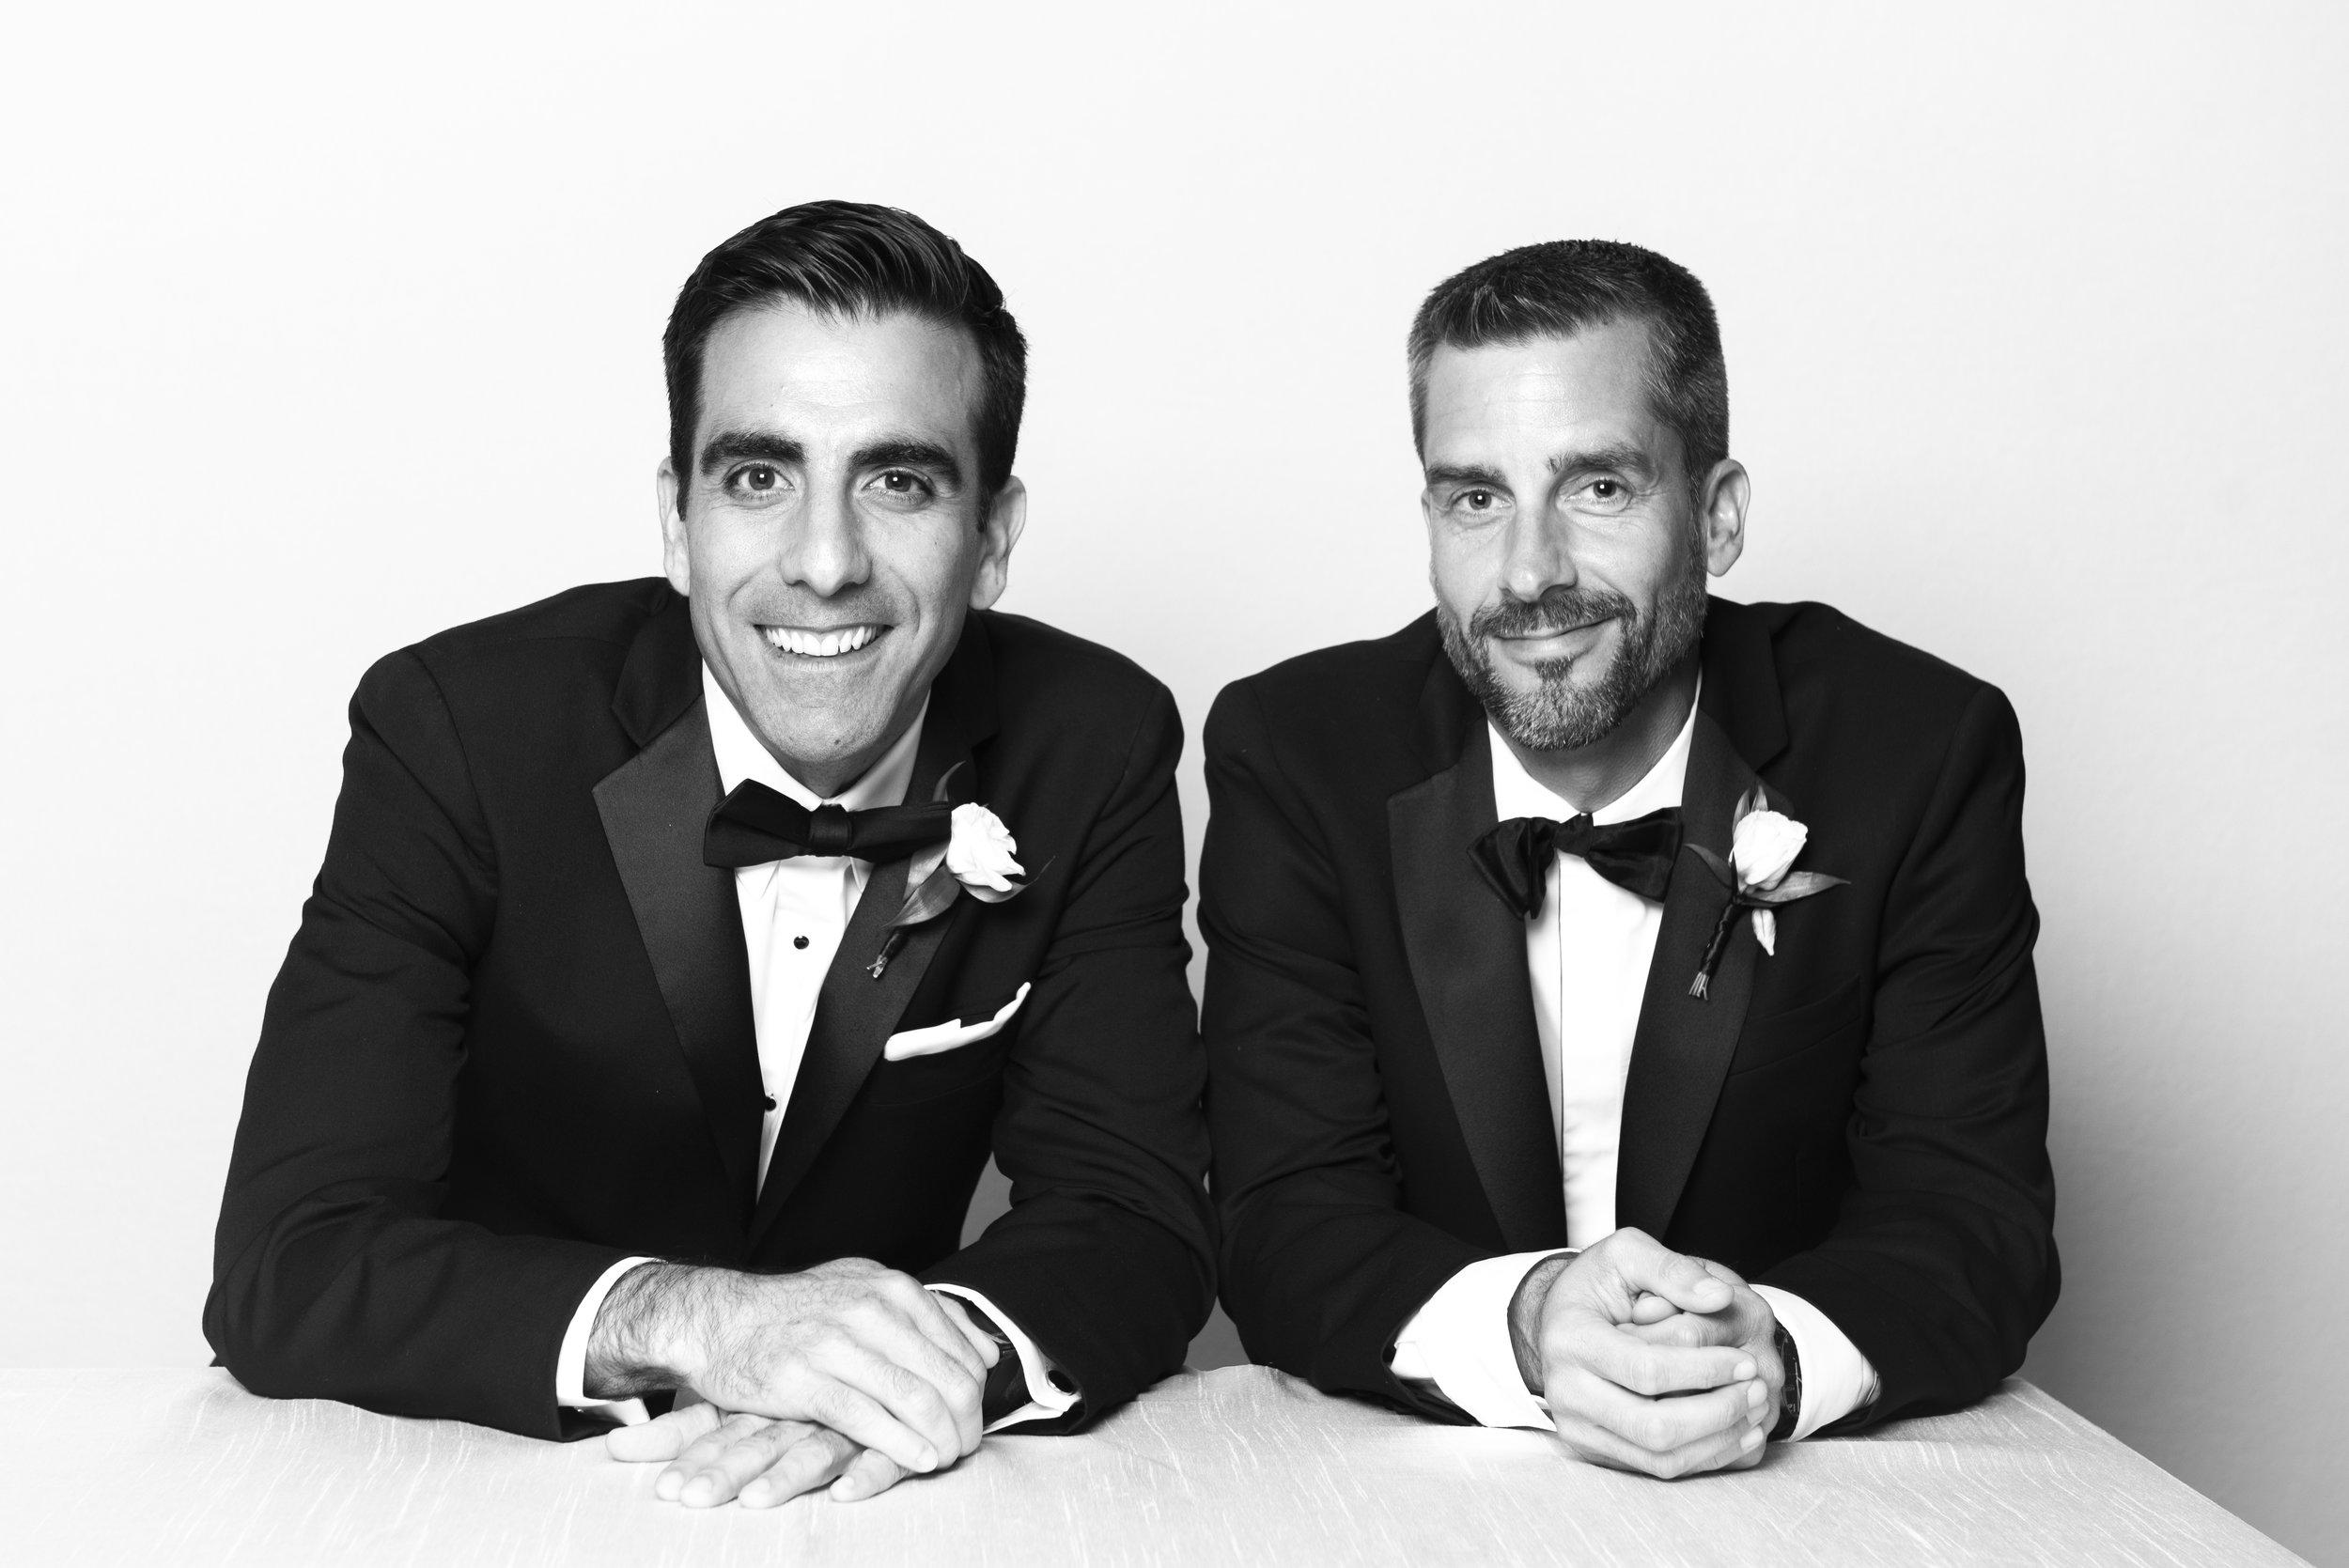 5ive15ifteen-515-Toronto-Wedding-Photographer-Portrait Booth-19.jpg